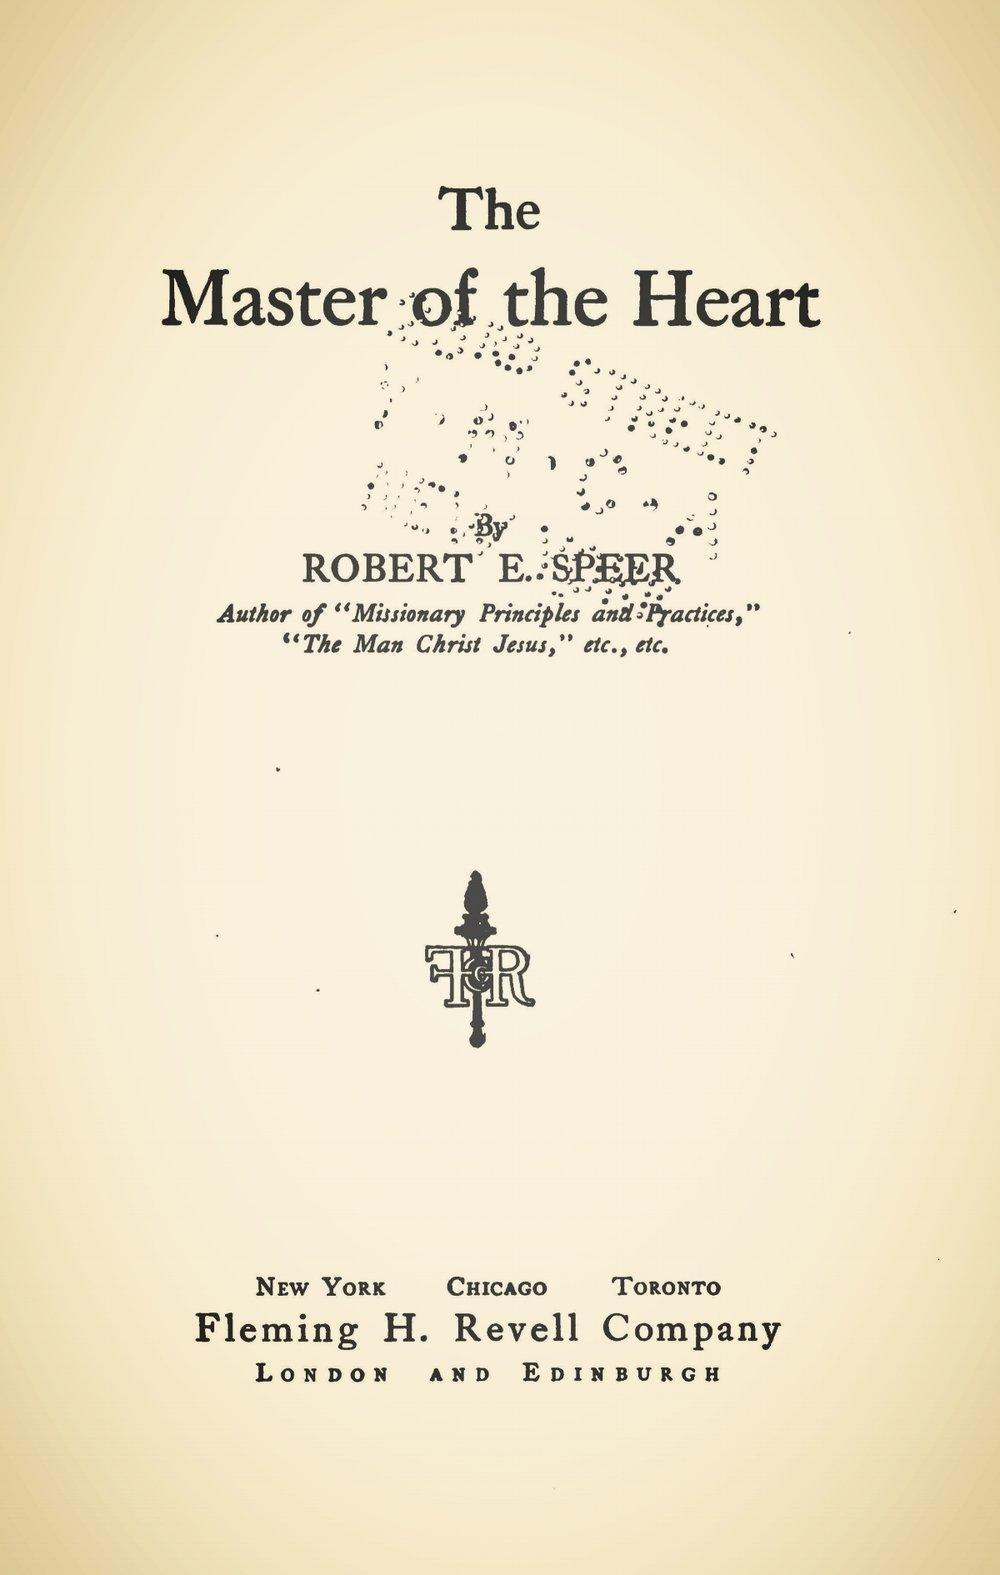 Speer, Robert Elliott, The Master of the Heart Title Page.jpg